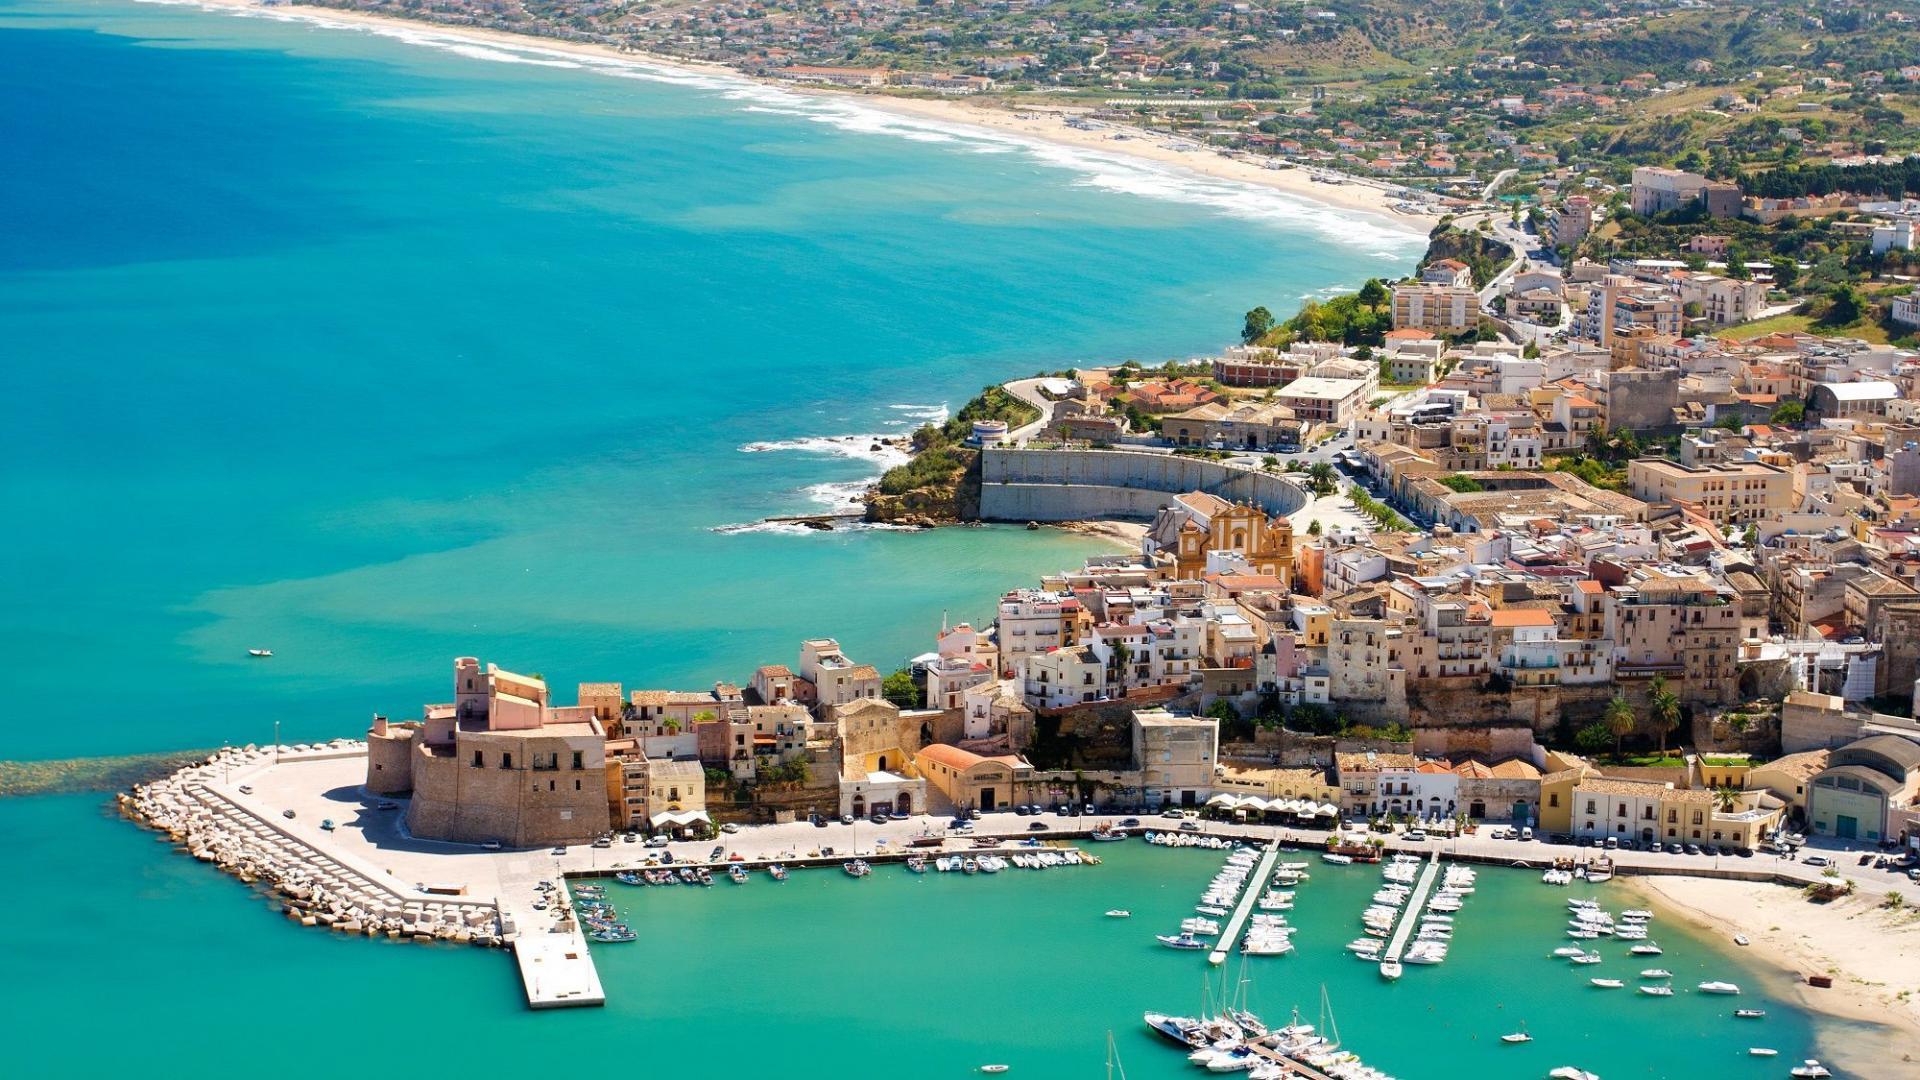 8- of 15-daagse vakantie in <b>Sicilië</b> incl. vlucht en huurauto <br/>EUR 379.00 <br/> <a href='https://www.cheap.nl/ttr/?tt=8820_326306_234289_&amp;r=https%3A%2F%2Fcheap.nl%2F3039%2F8-of-15-dagen-sicilie-incl-vlucht-huurauto' target='_blank'>Bekijk Nu</a>